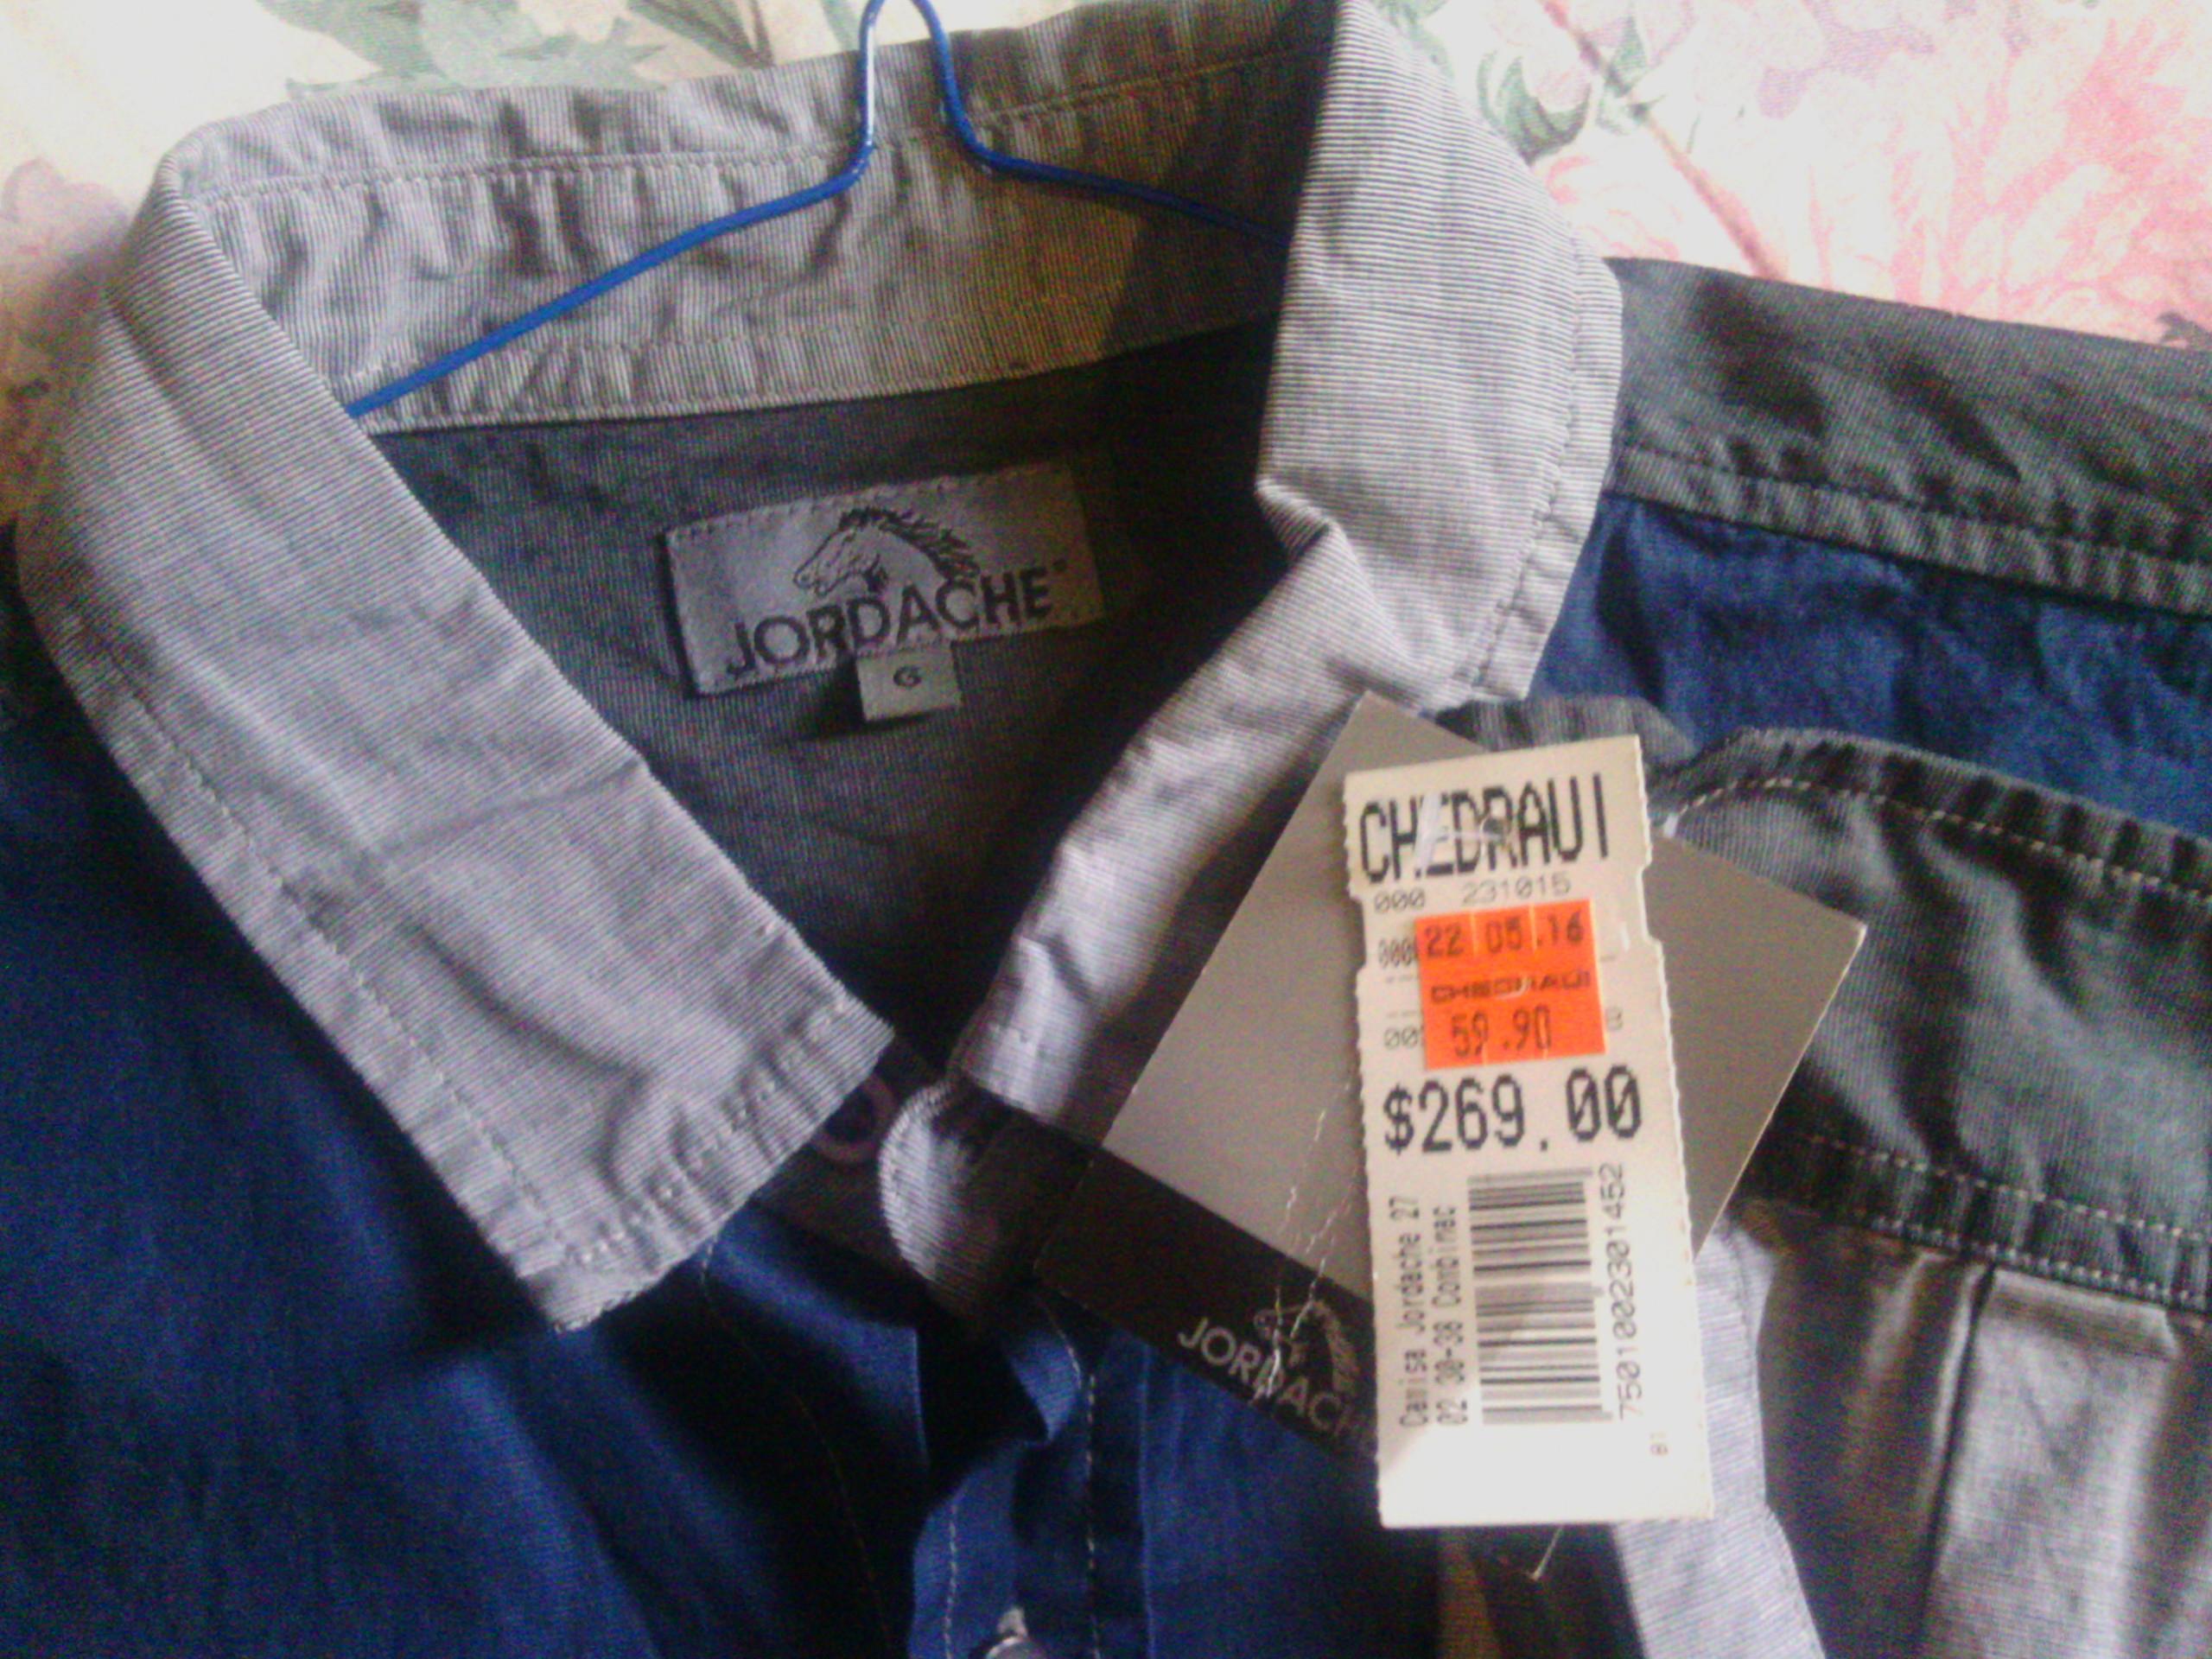 Chedraui Coapa: Camisas Jordache a $59.90